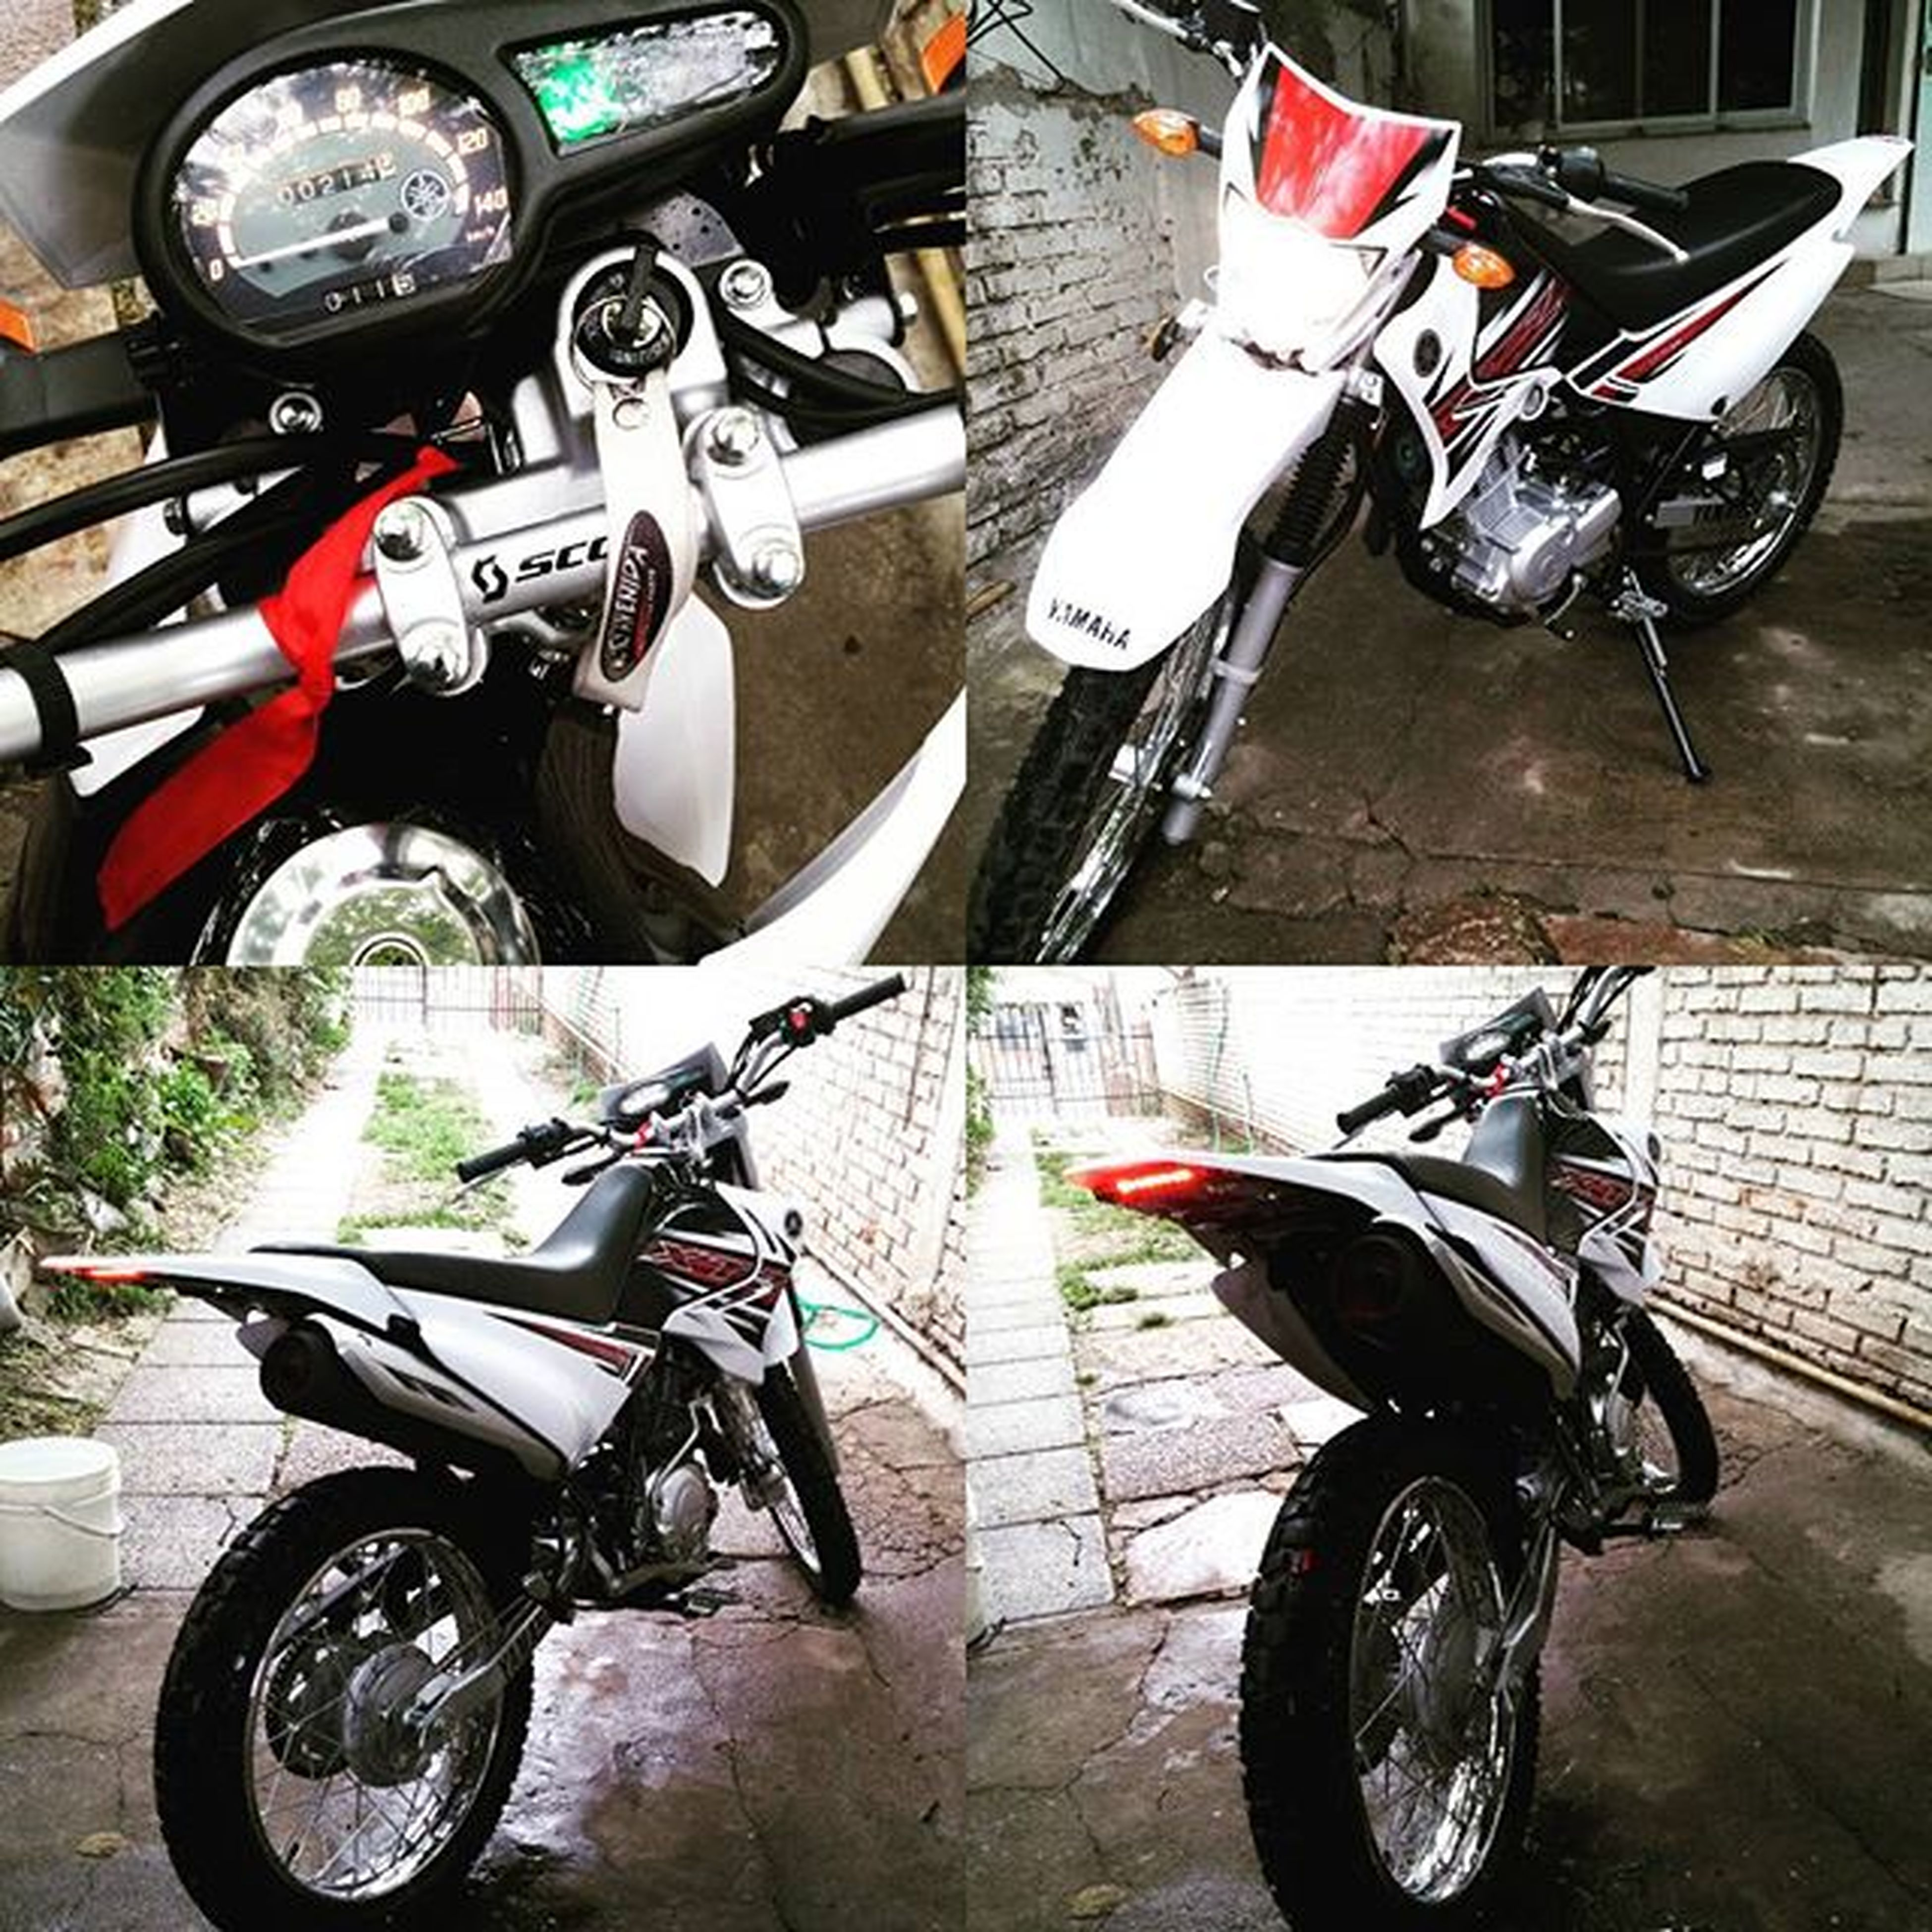 Yamaha Xtz125 2015  =)